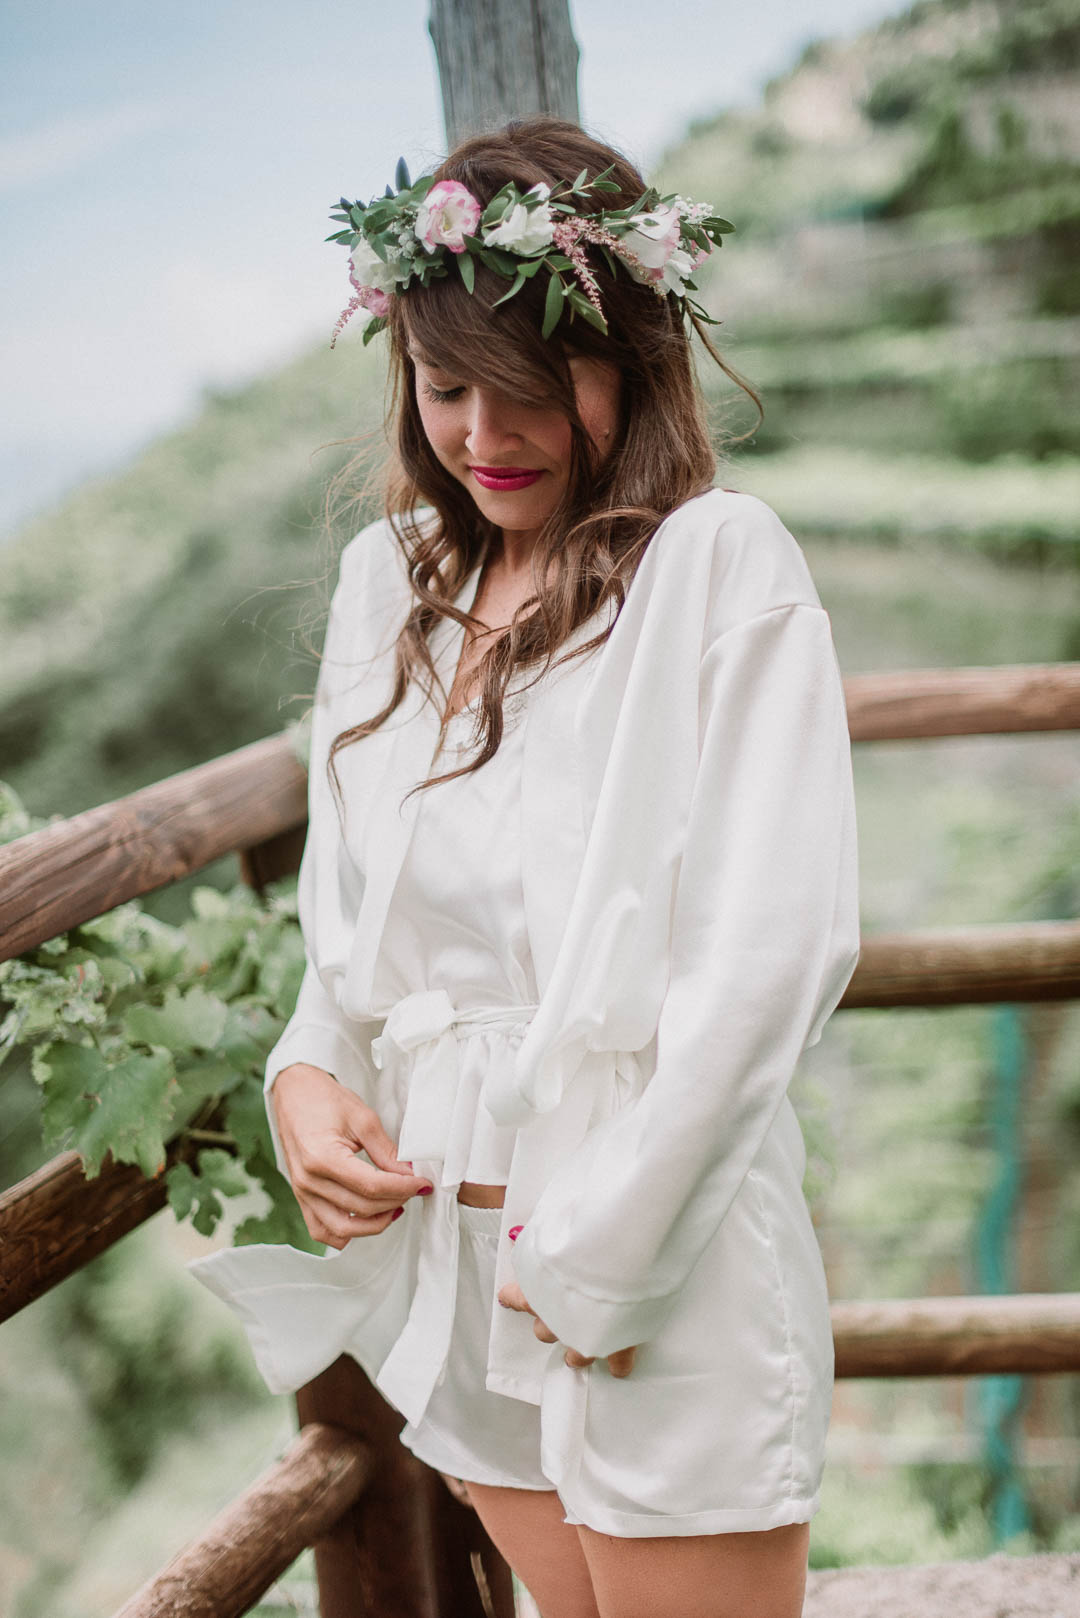 wedding-photographer-destination-fineart-bespoke-reportage-amalficoast-torrelacerniola-vivianeizzo-spazio46-33